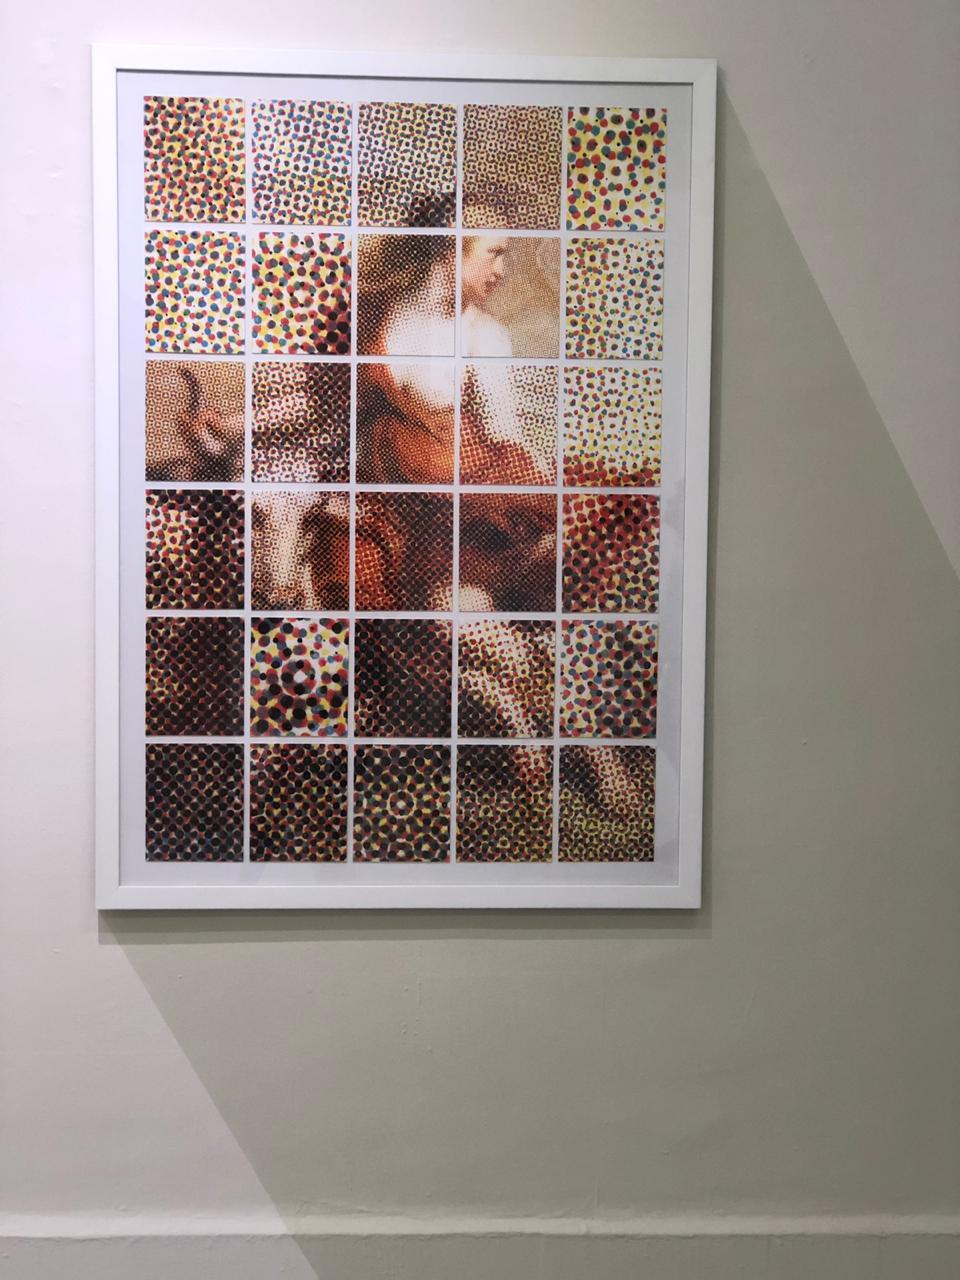 Vista de instalación, Roseta, Andrés Felipe Castaño, Galería Karen Huber, 2019, Cortesía de Galería Karen Huber